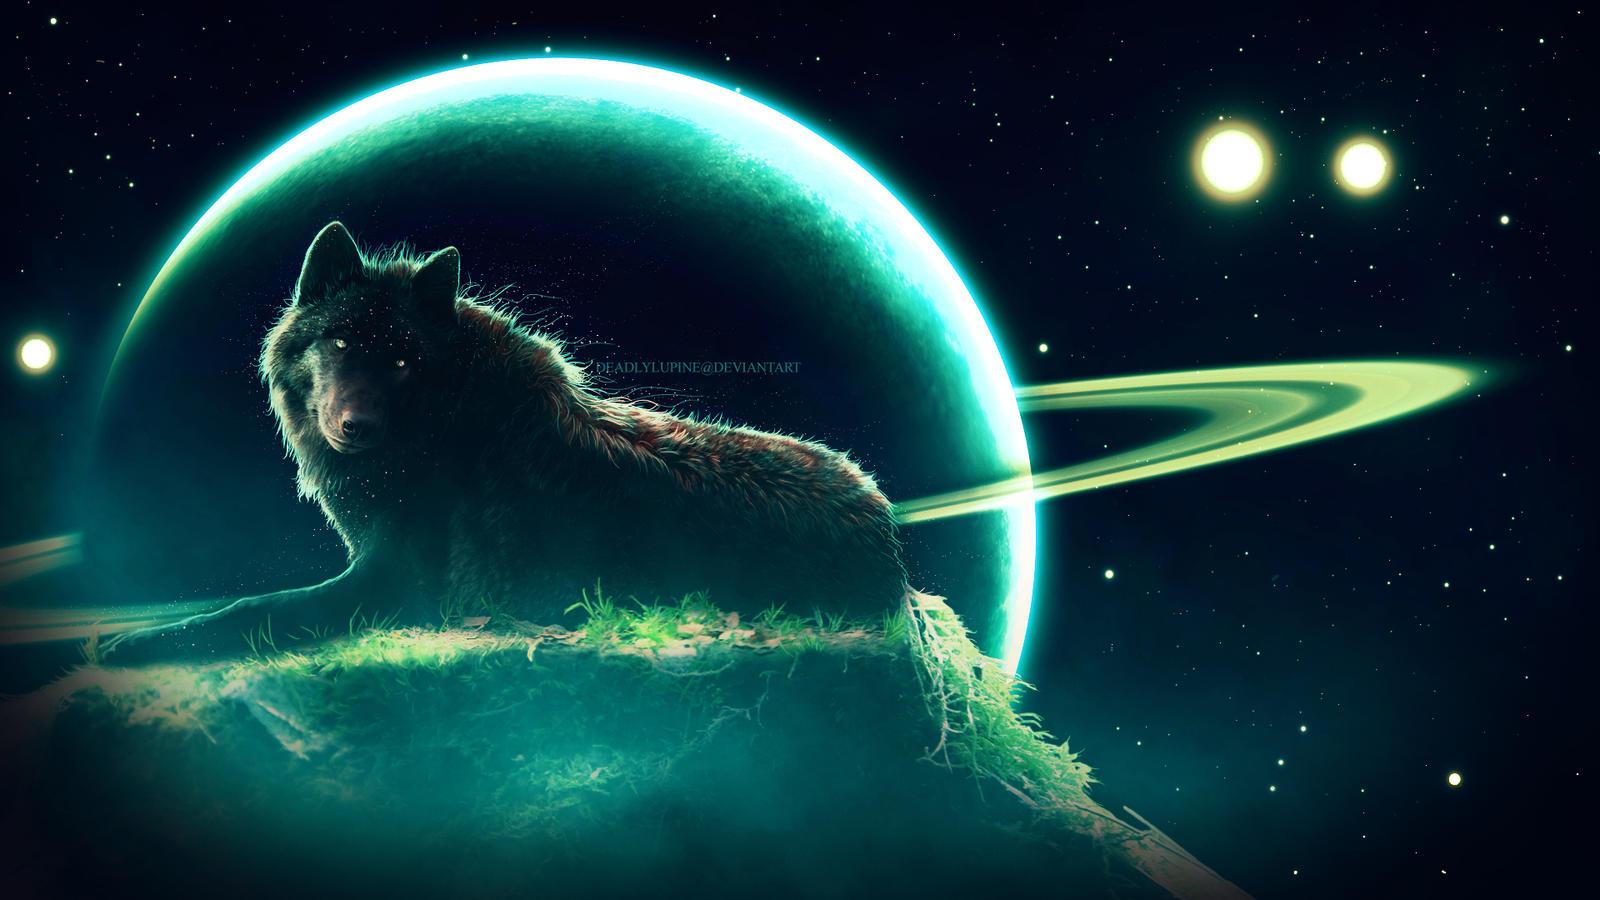 Starfall - In SPACE!